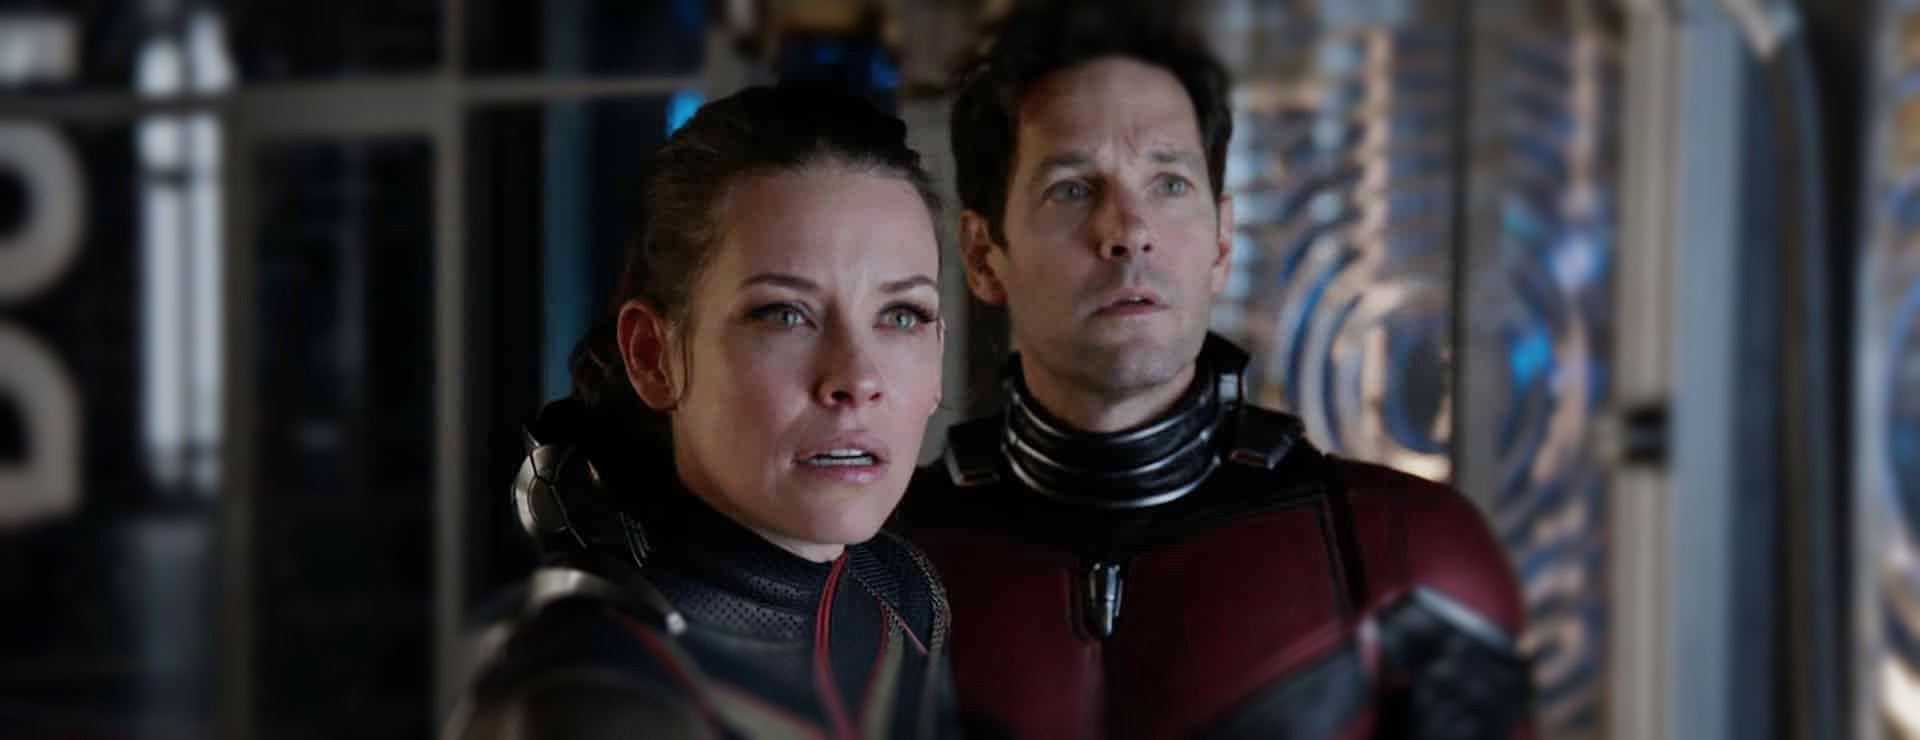 Avengers: Endgame, una scena tagliata con Ant-Man e Wasp thumbnail